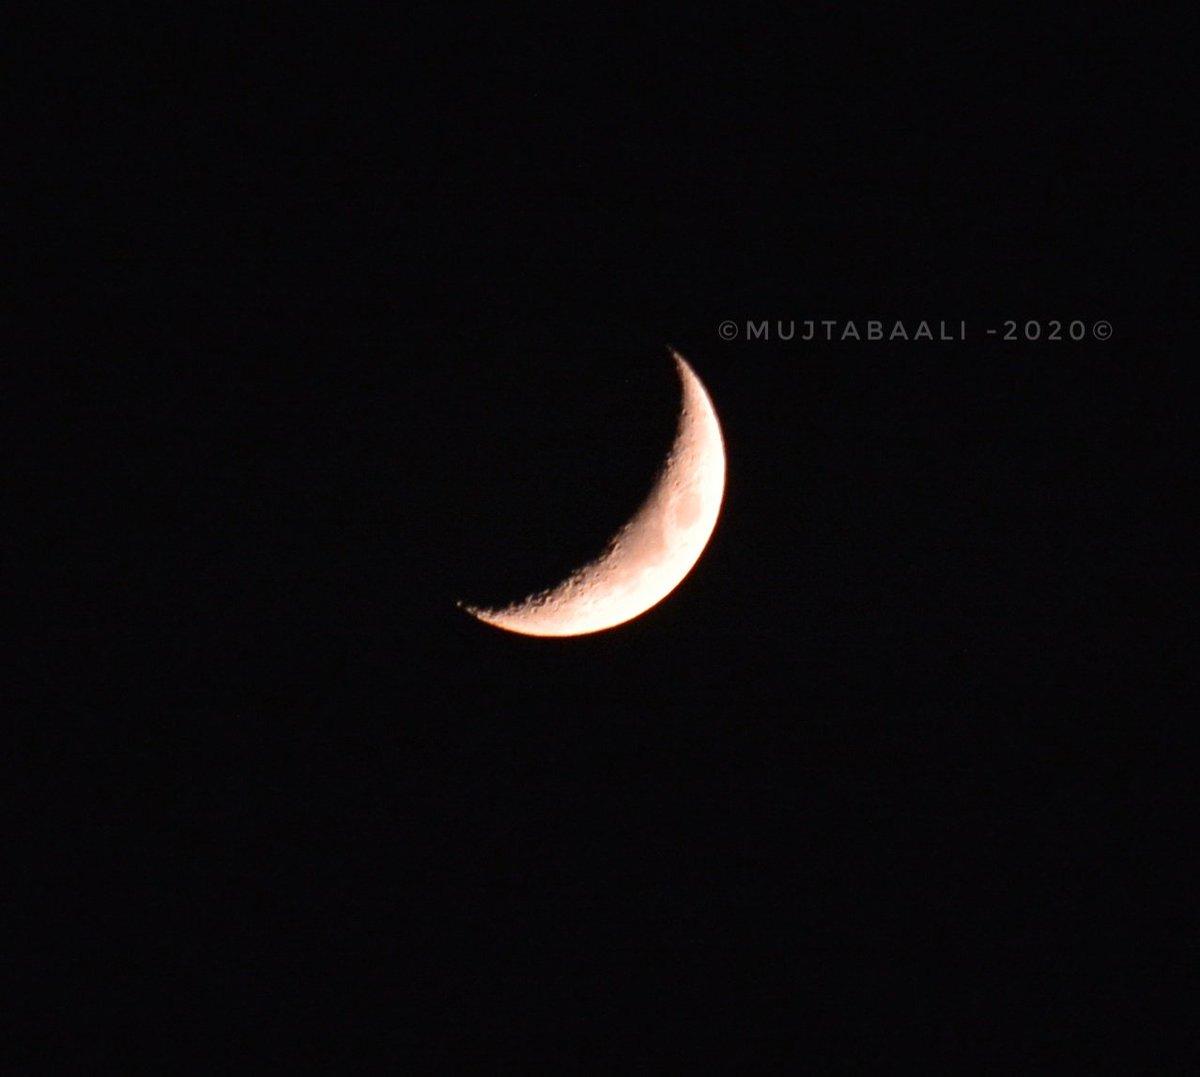 The moon is the reflection of your heart and moonlight is the twinkle of your love.#today #moonphotography🌙📷 @aboali_syed @kumailansari  @SakeenaSyedaa @shujaat98 @shahriyarsyed1 @PressTV @AP @AgaHussaini @SyedAbidShah @tanvirsadiq @GreaterKashmir @ETTravelNews @TravelMagazine https://t.co/I2QOcLr4dx